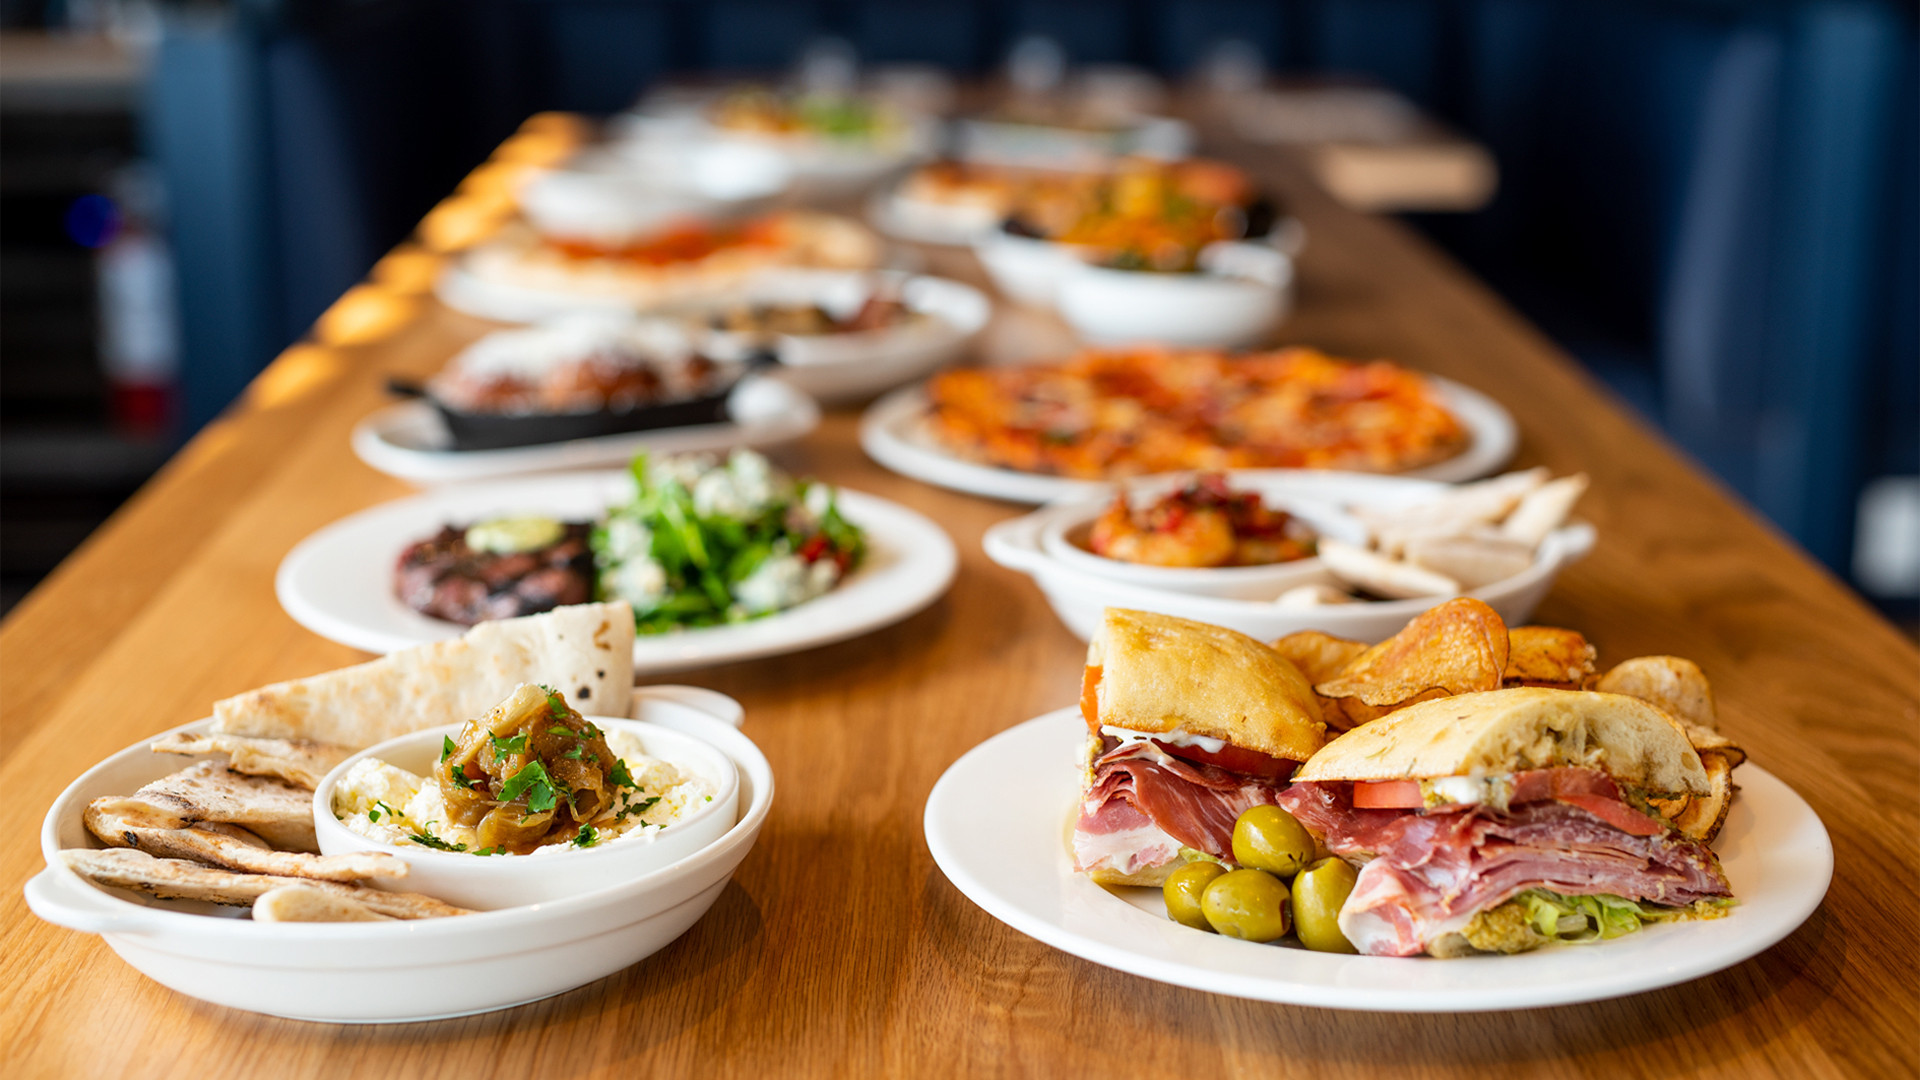 Best road trip worthy restaurants near Toronto | Port, Pickering Ontario